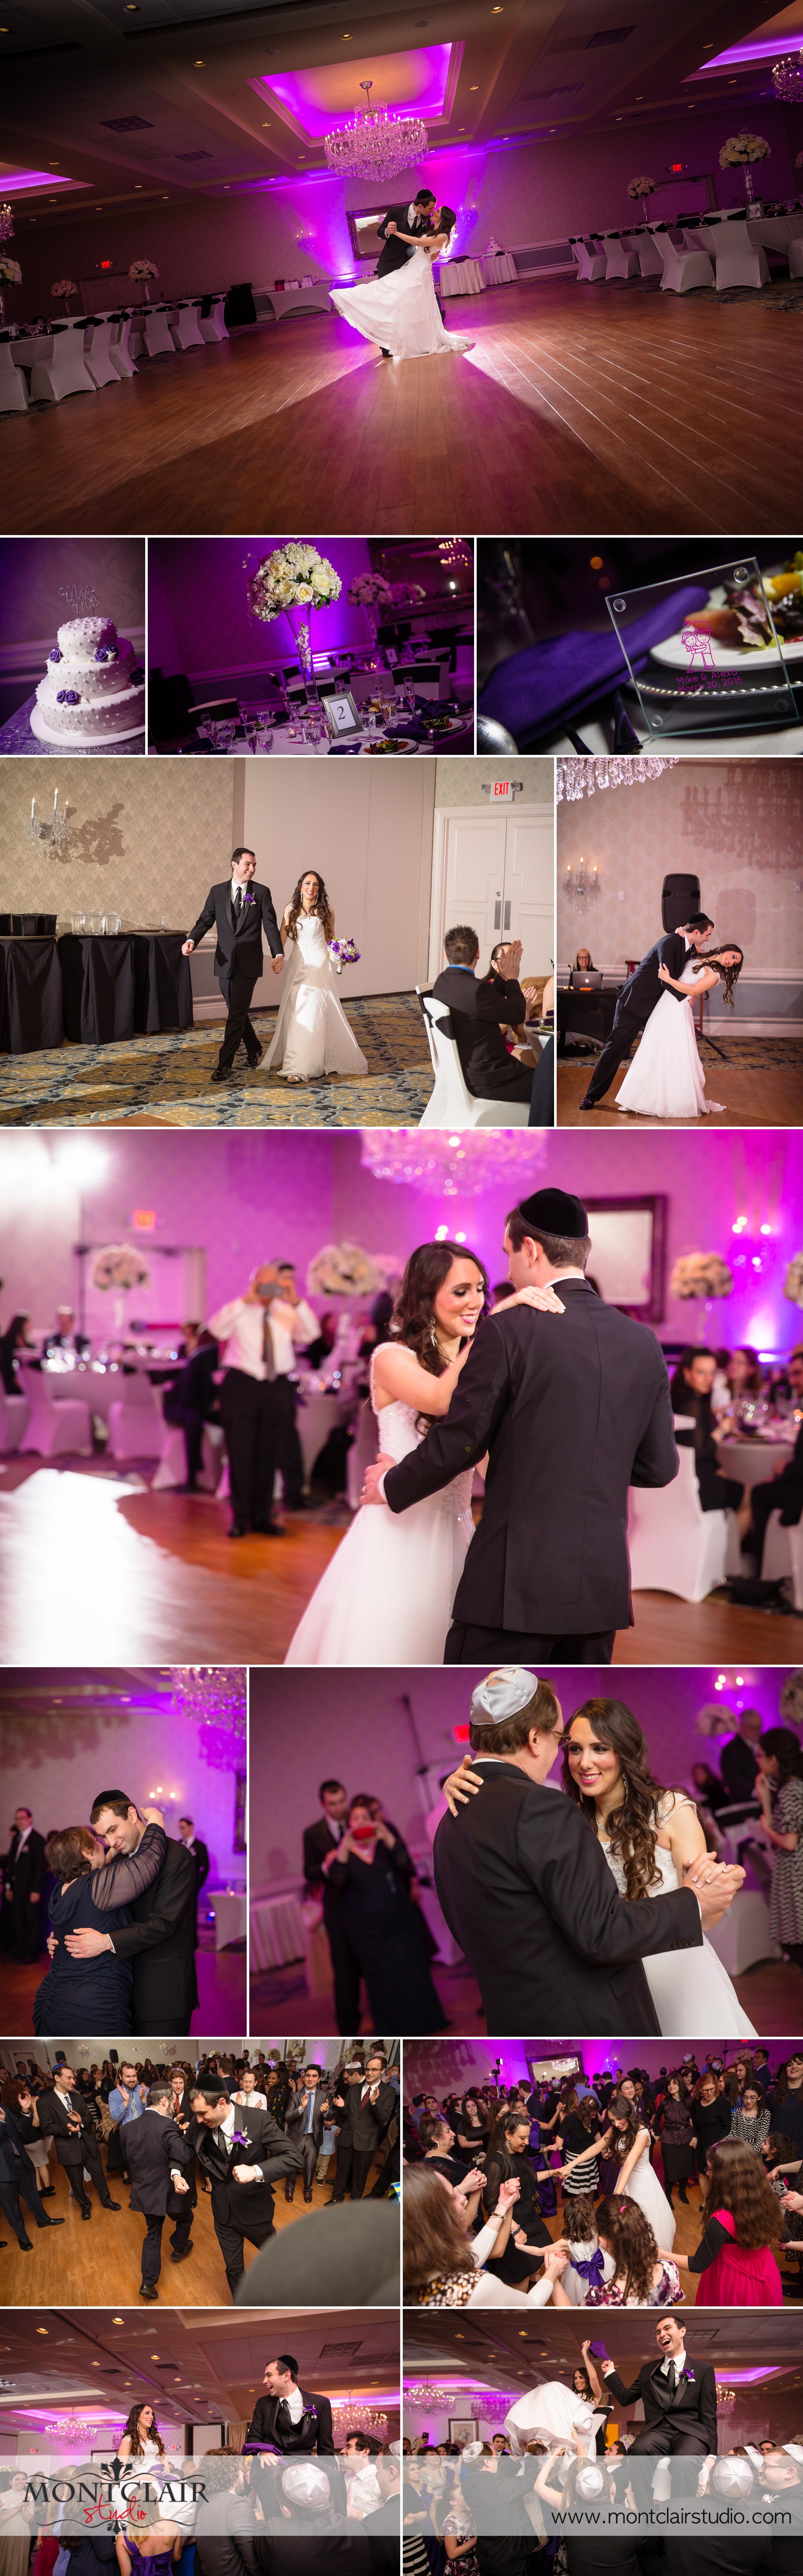 Alexa And Micheal Wedding Radisson Hotel  4.jpg